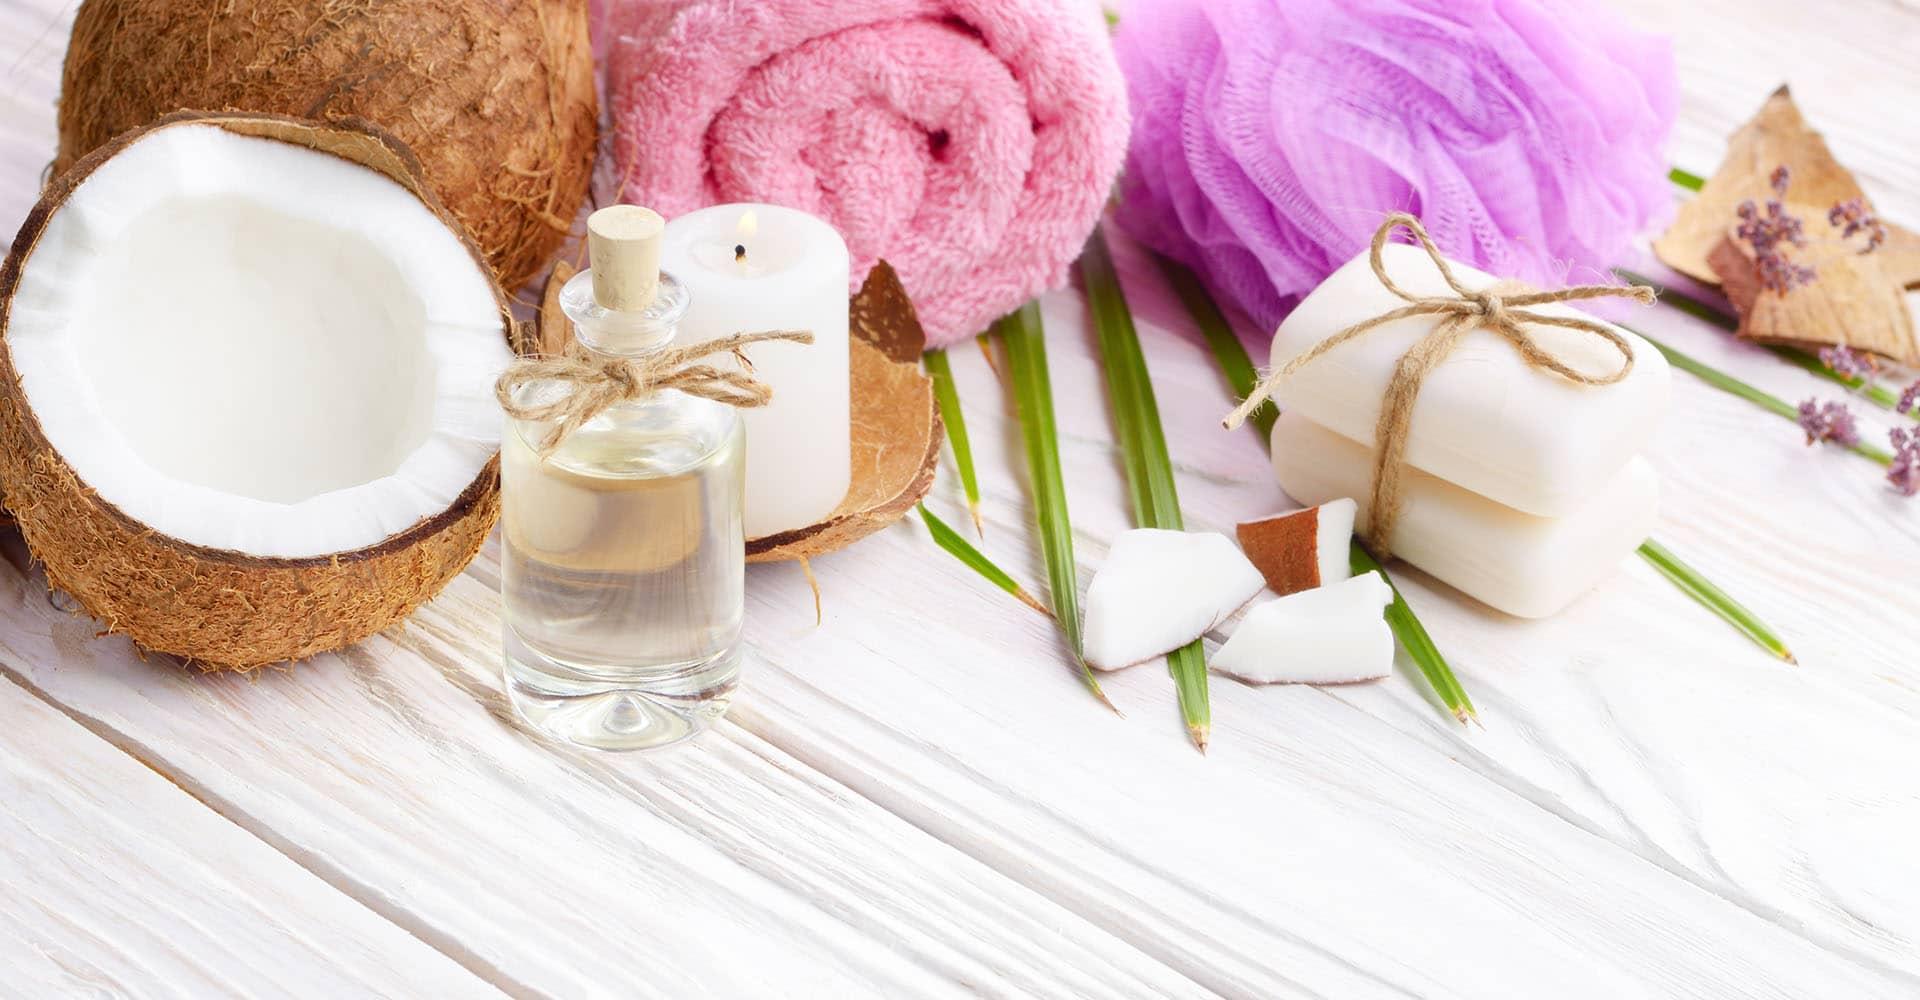 Kokosöl für Wellness